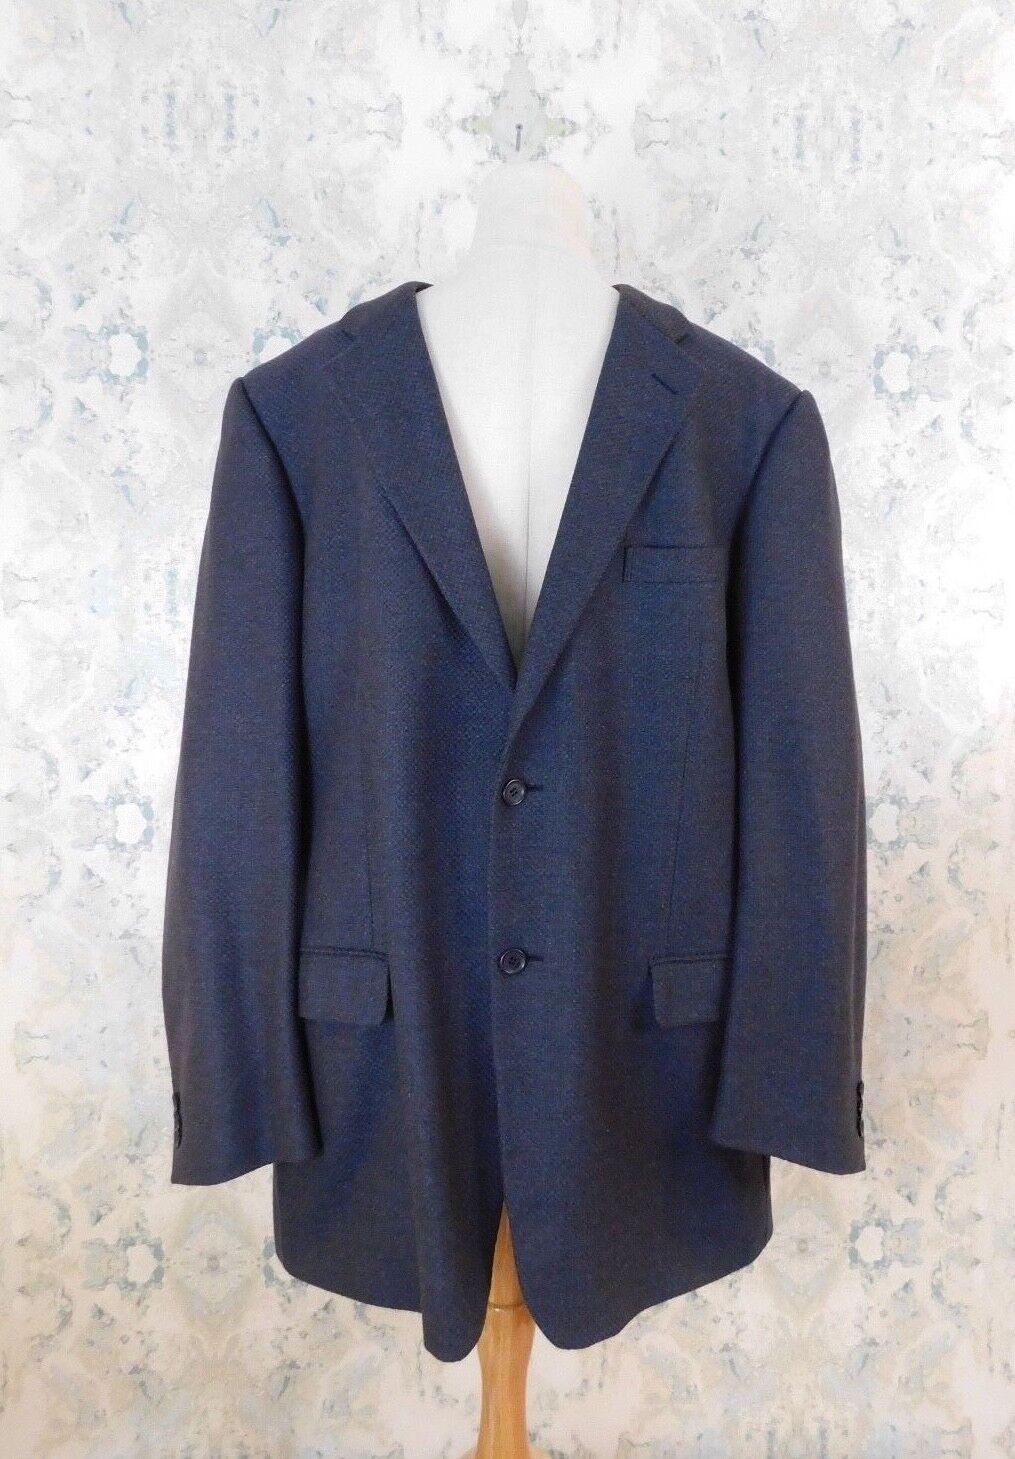 Ermenegildo Zegna Soft Blau Braun Wool Cashmere Blazer Sport Coat IT 54 US 44